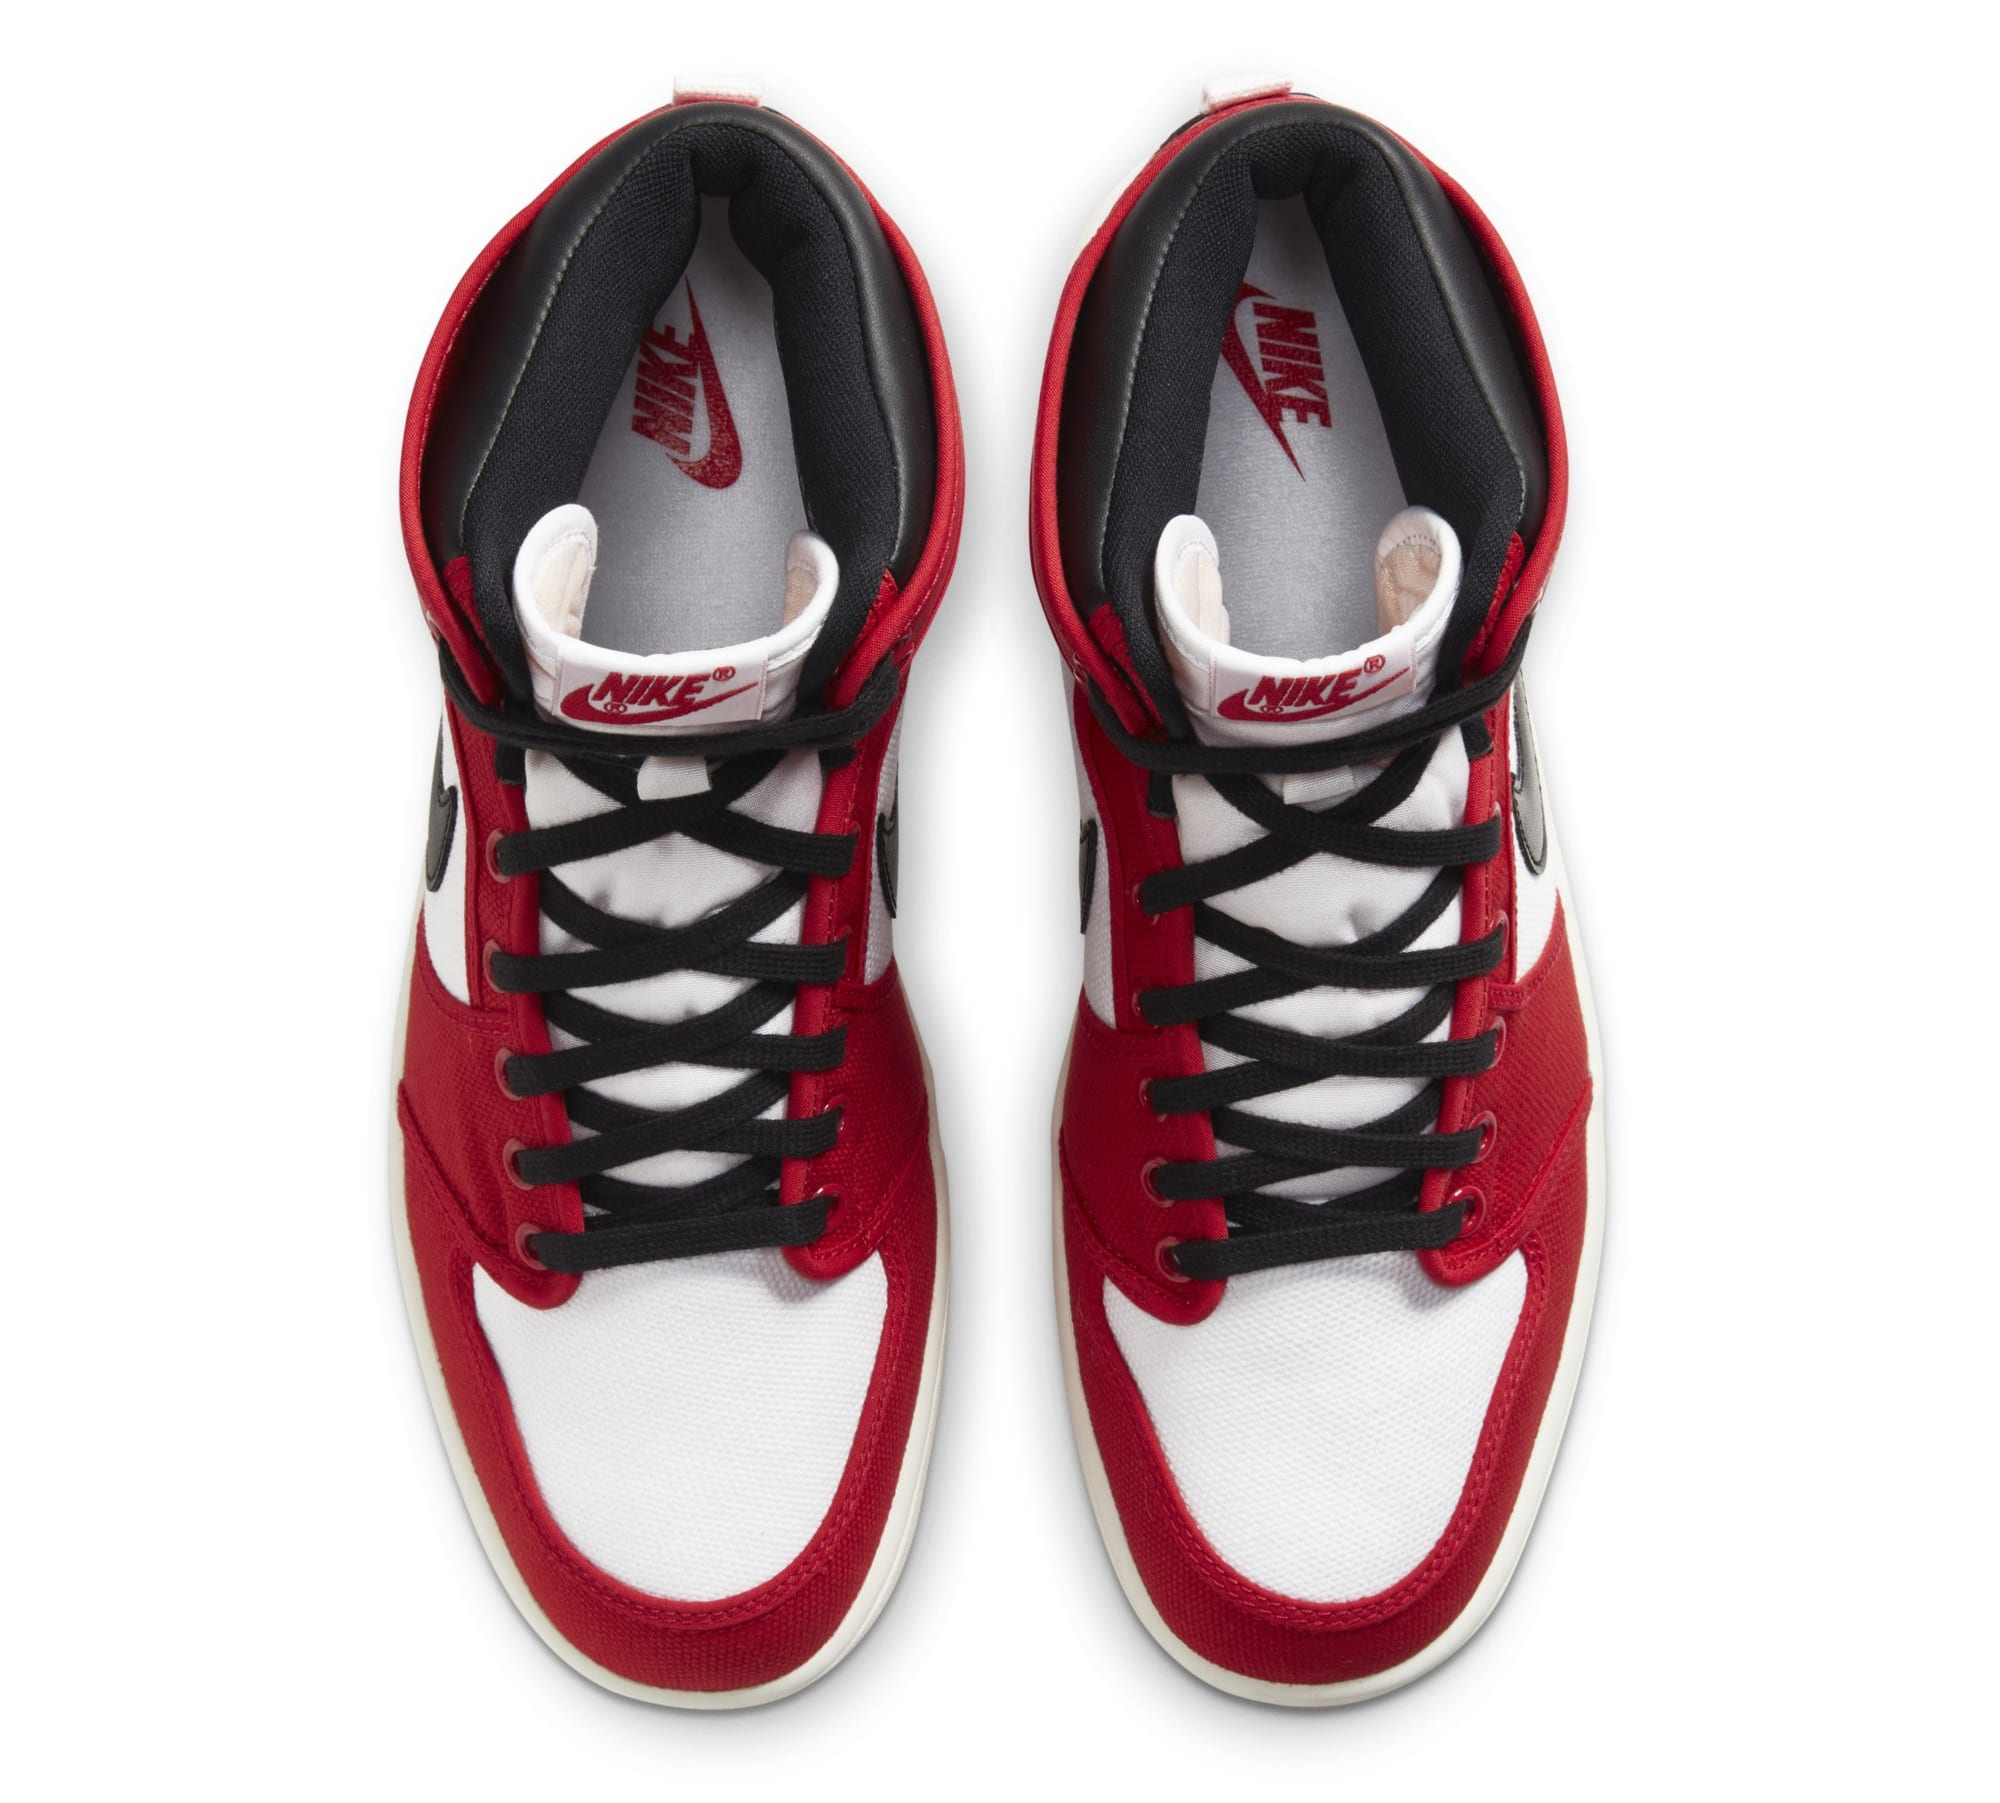 Air Jordan 1 KO 'Chicago' DA9089-100 (Top)